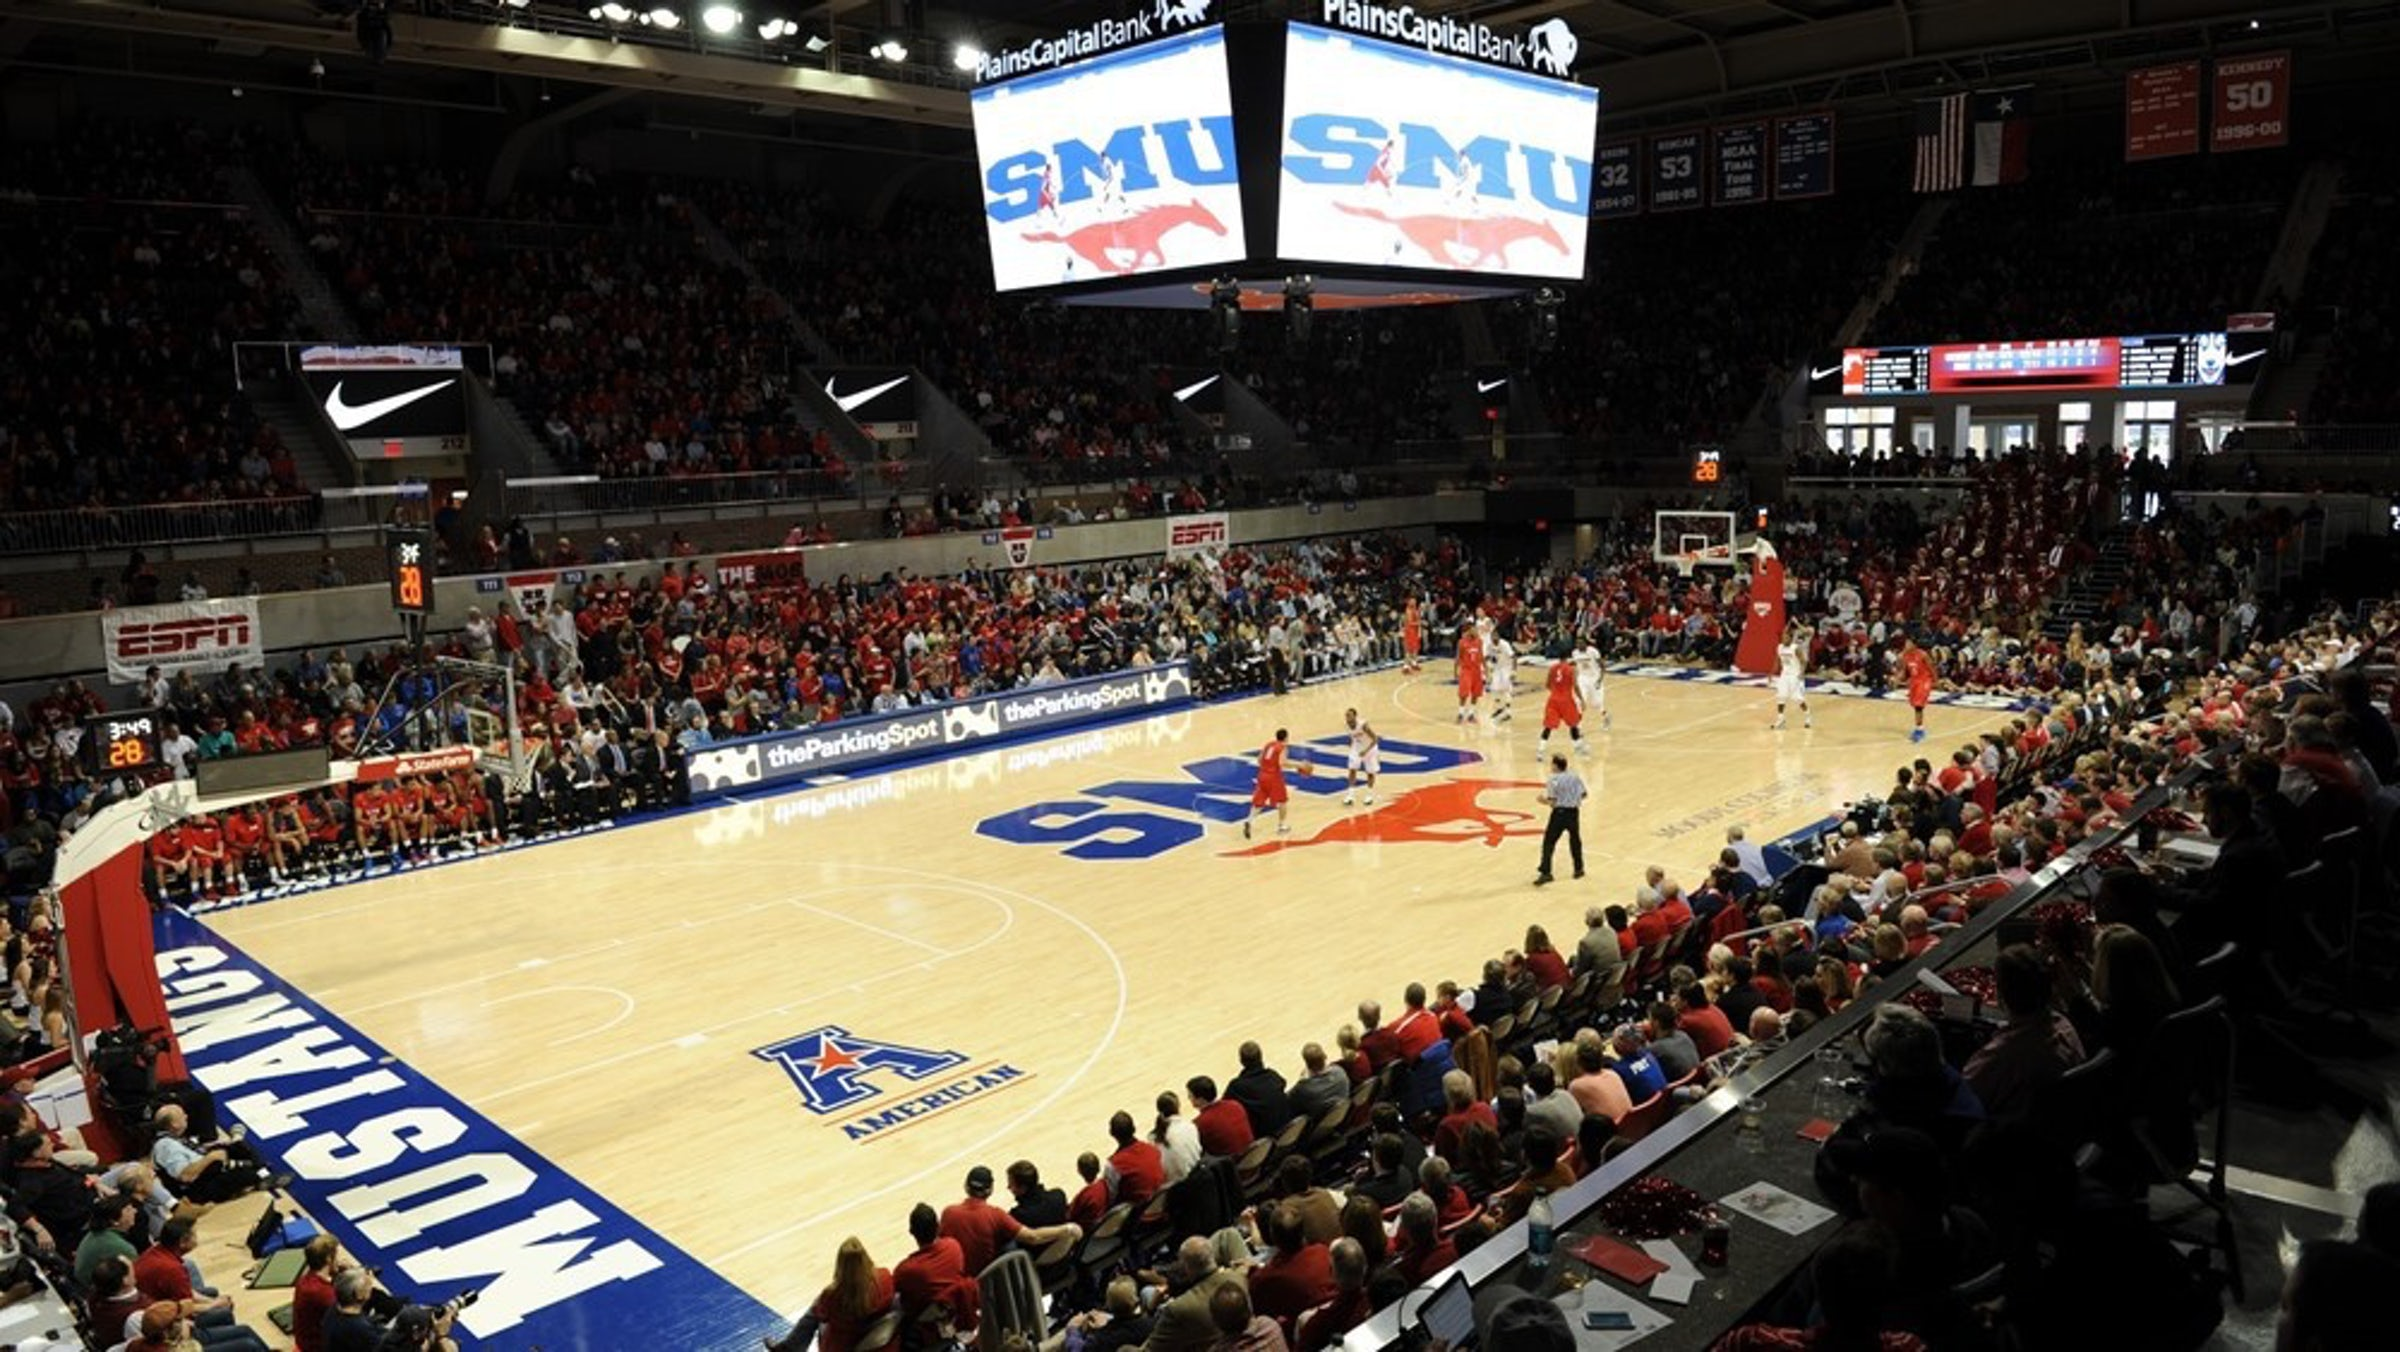 SMU - Moody Coliseum